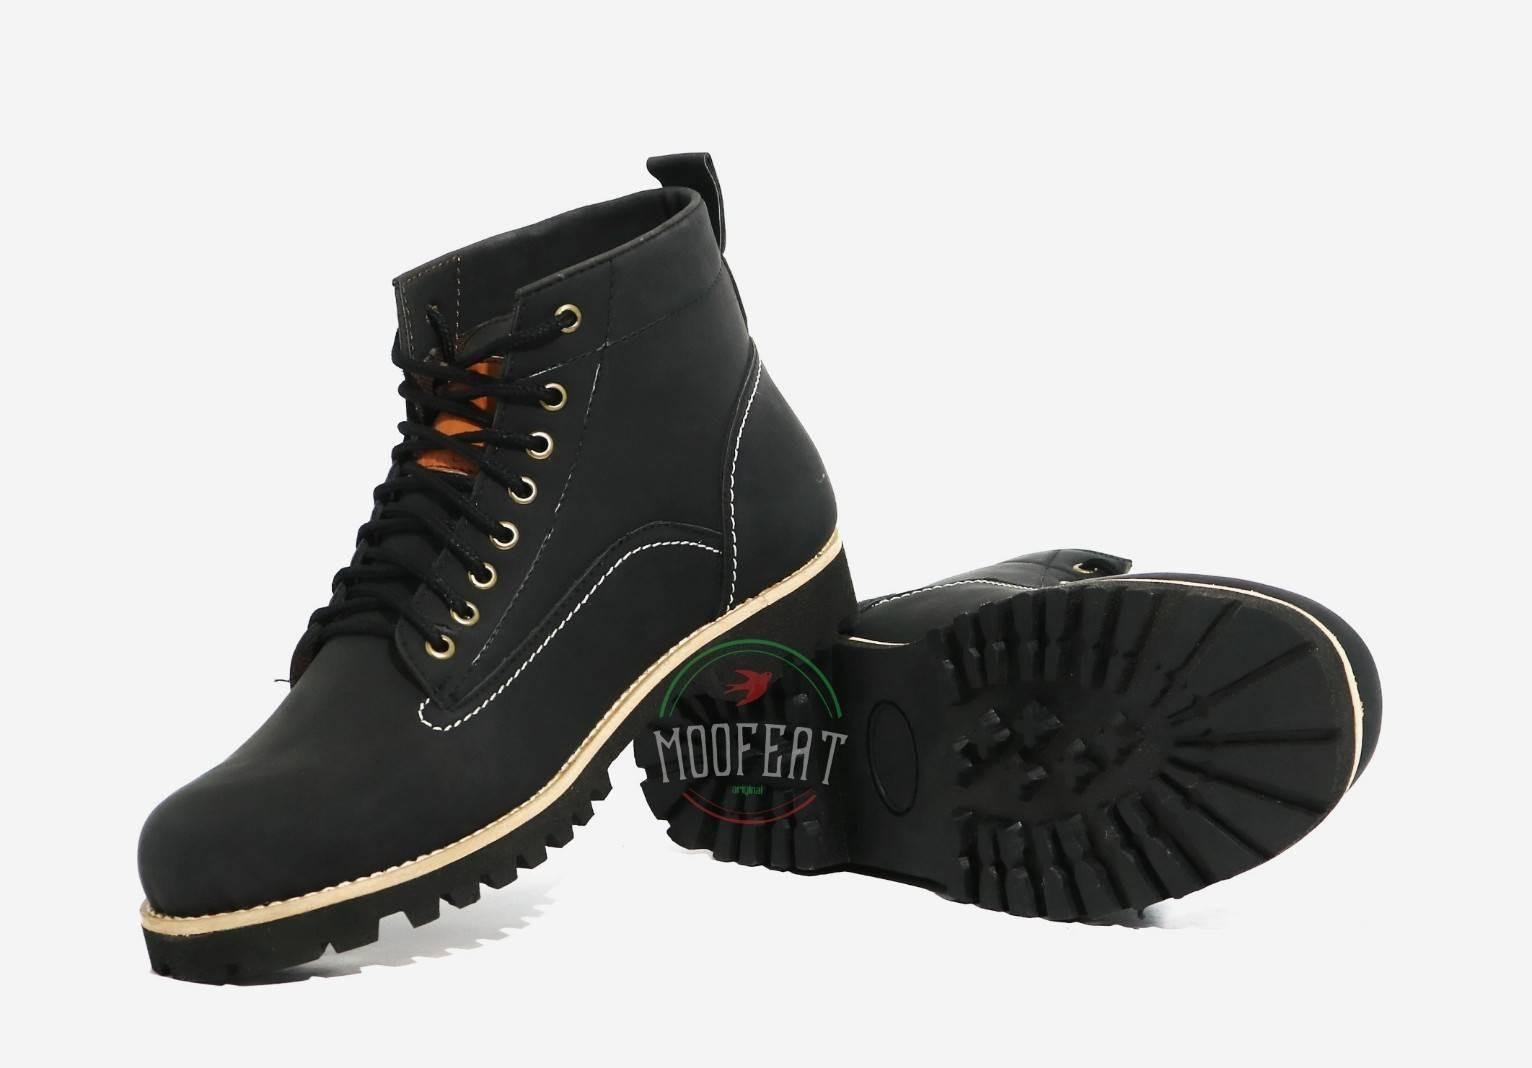 Sepatu Boots Pria Moofeat Edward Ring Hitam Original Clothing Kerja Pria  Work   Style High Quality fcafb58eb5